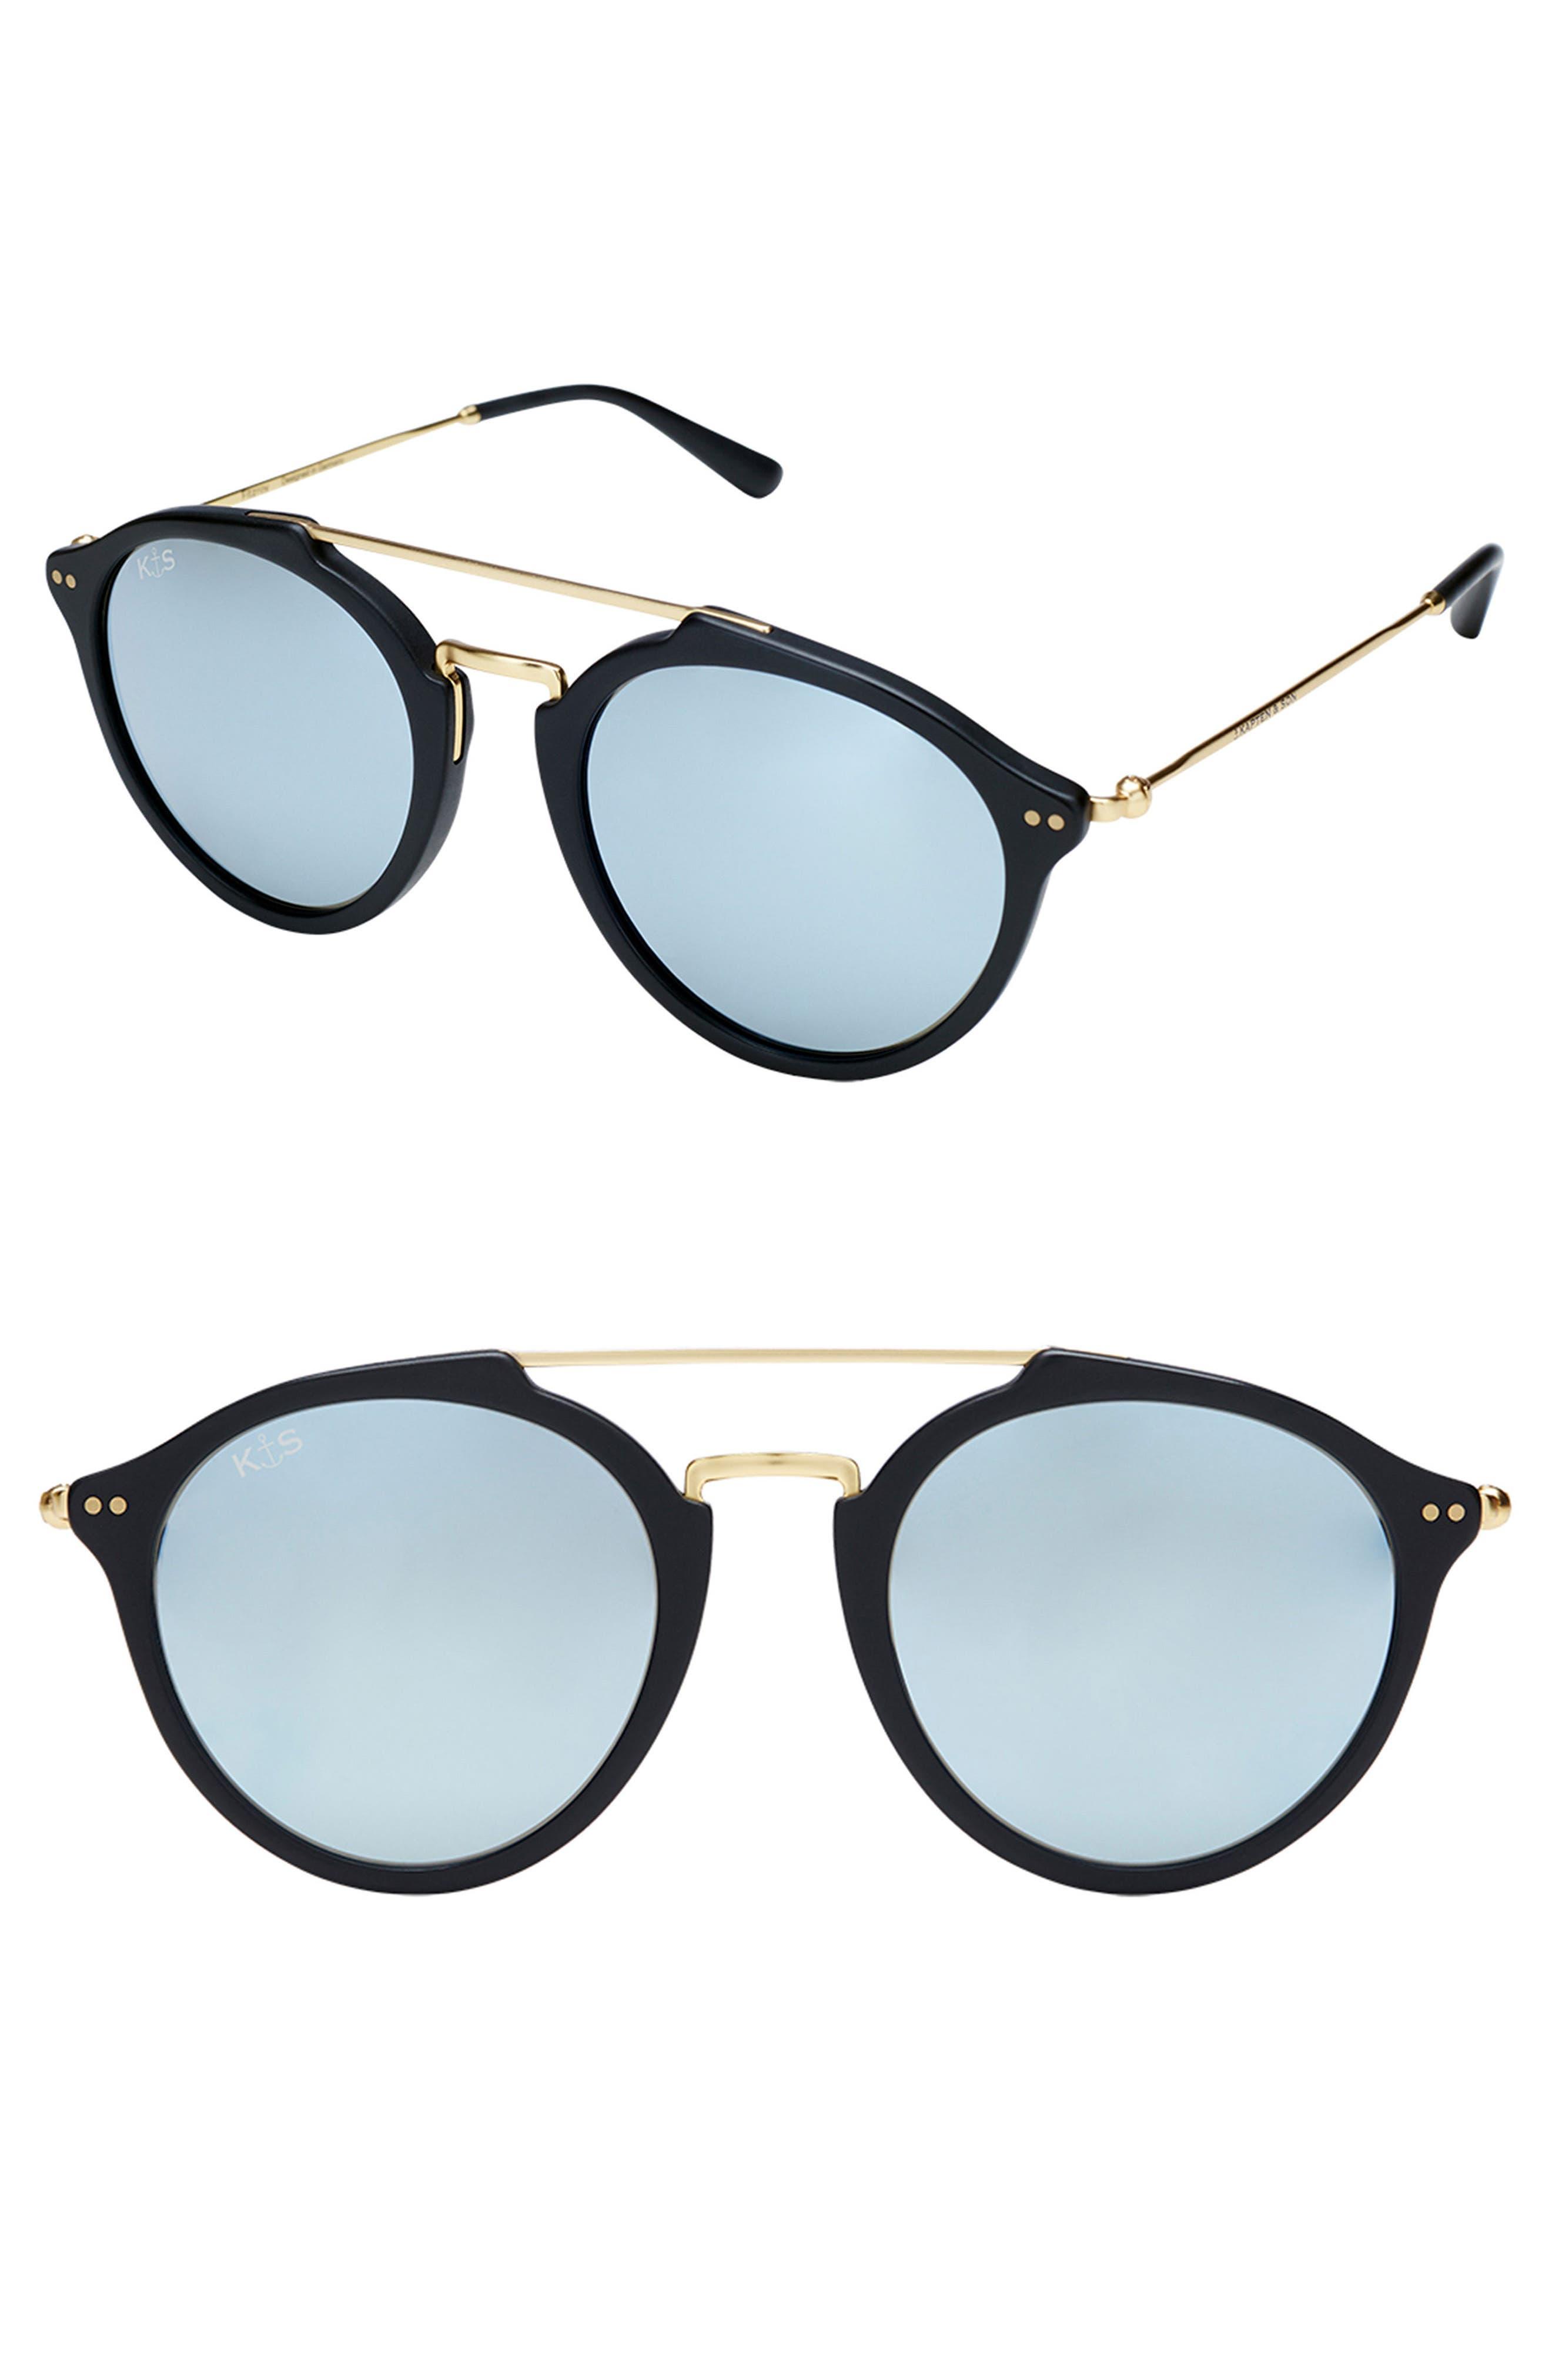 Kapten & Son Fitzroy 48mm Sunglasses